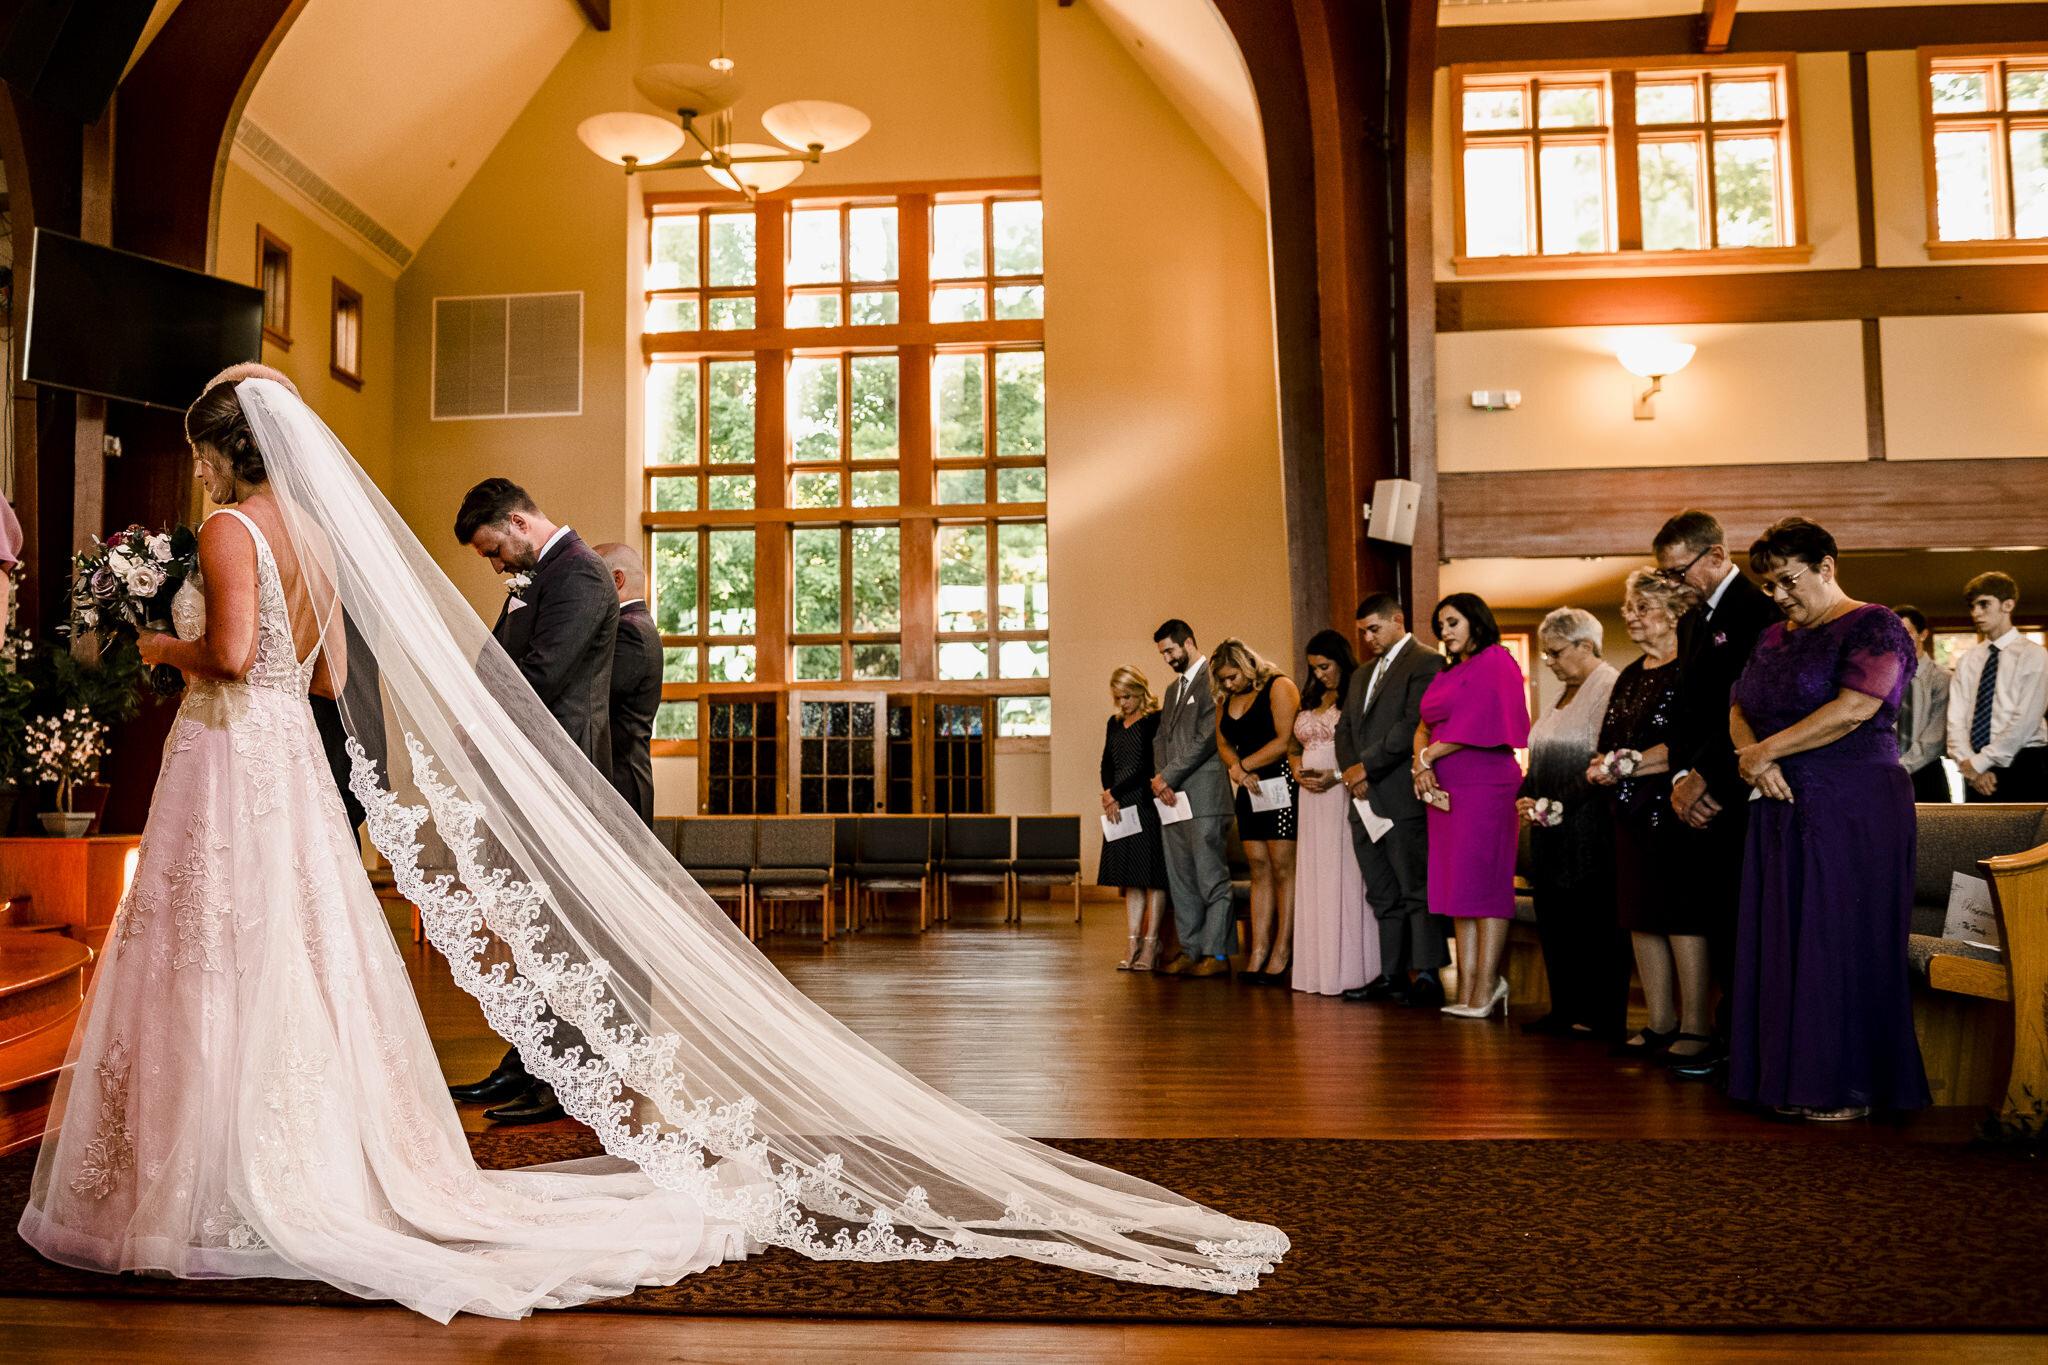 Coyle-Forsgate-Country-Club-Wedding-Photographer-10.JPG